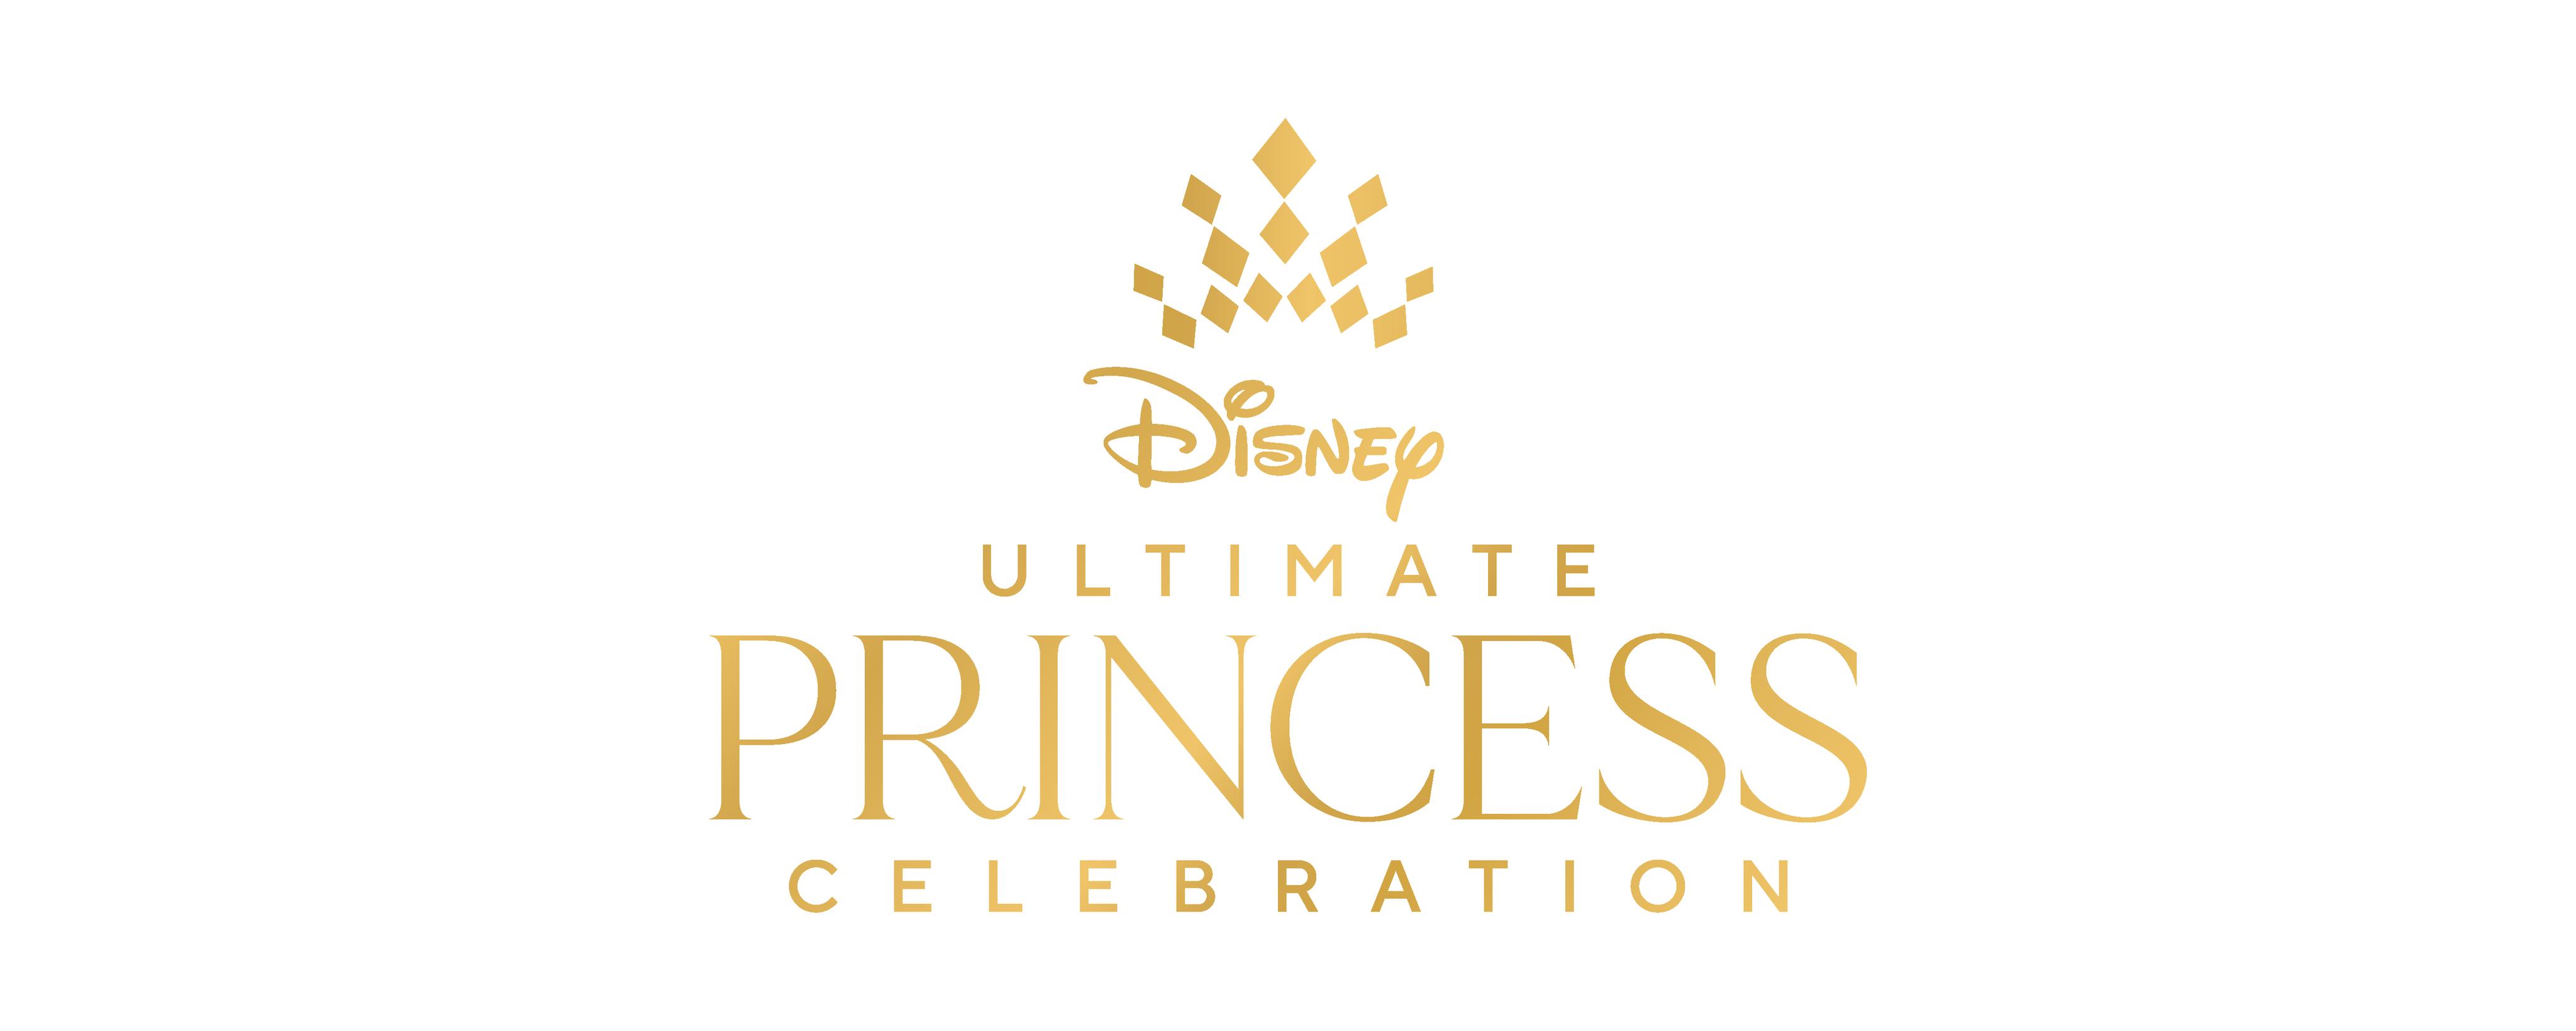 Disney Ultimate Princess Celebration